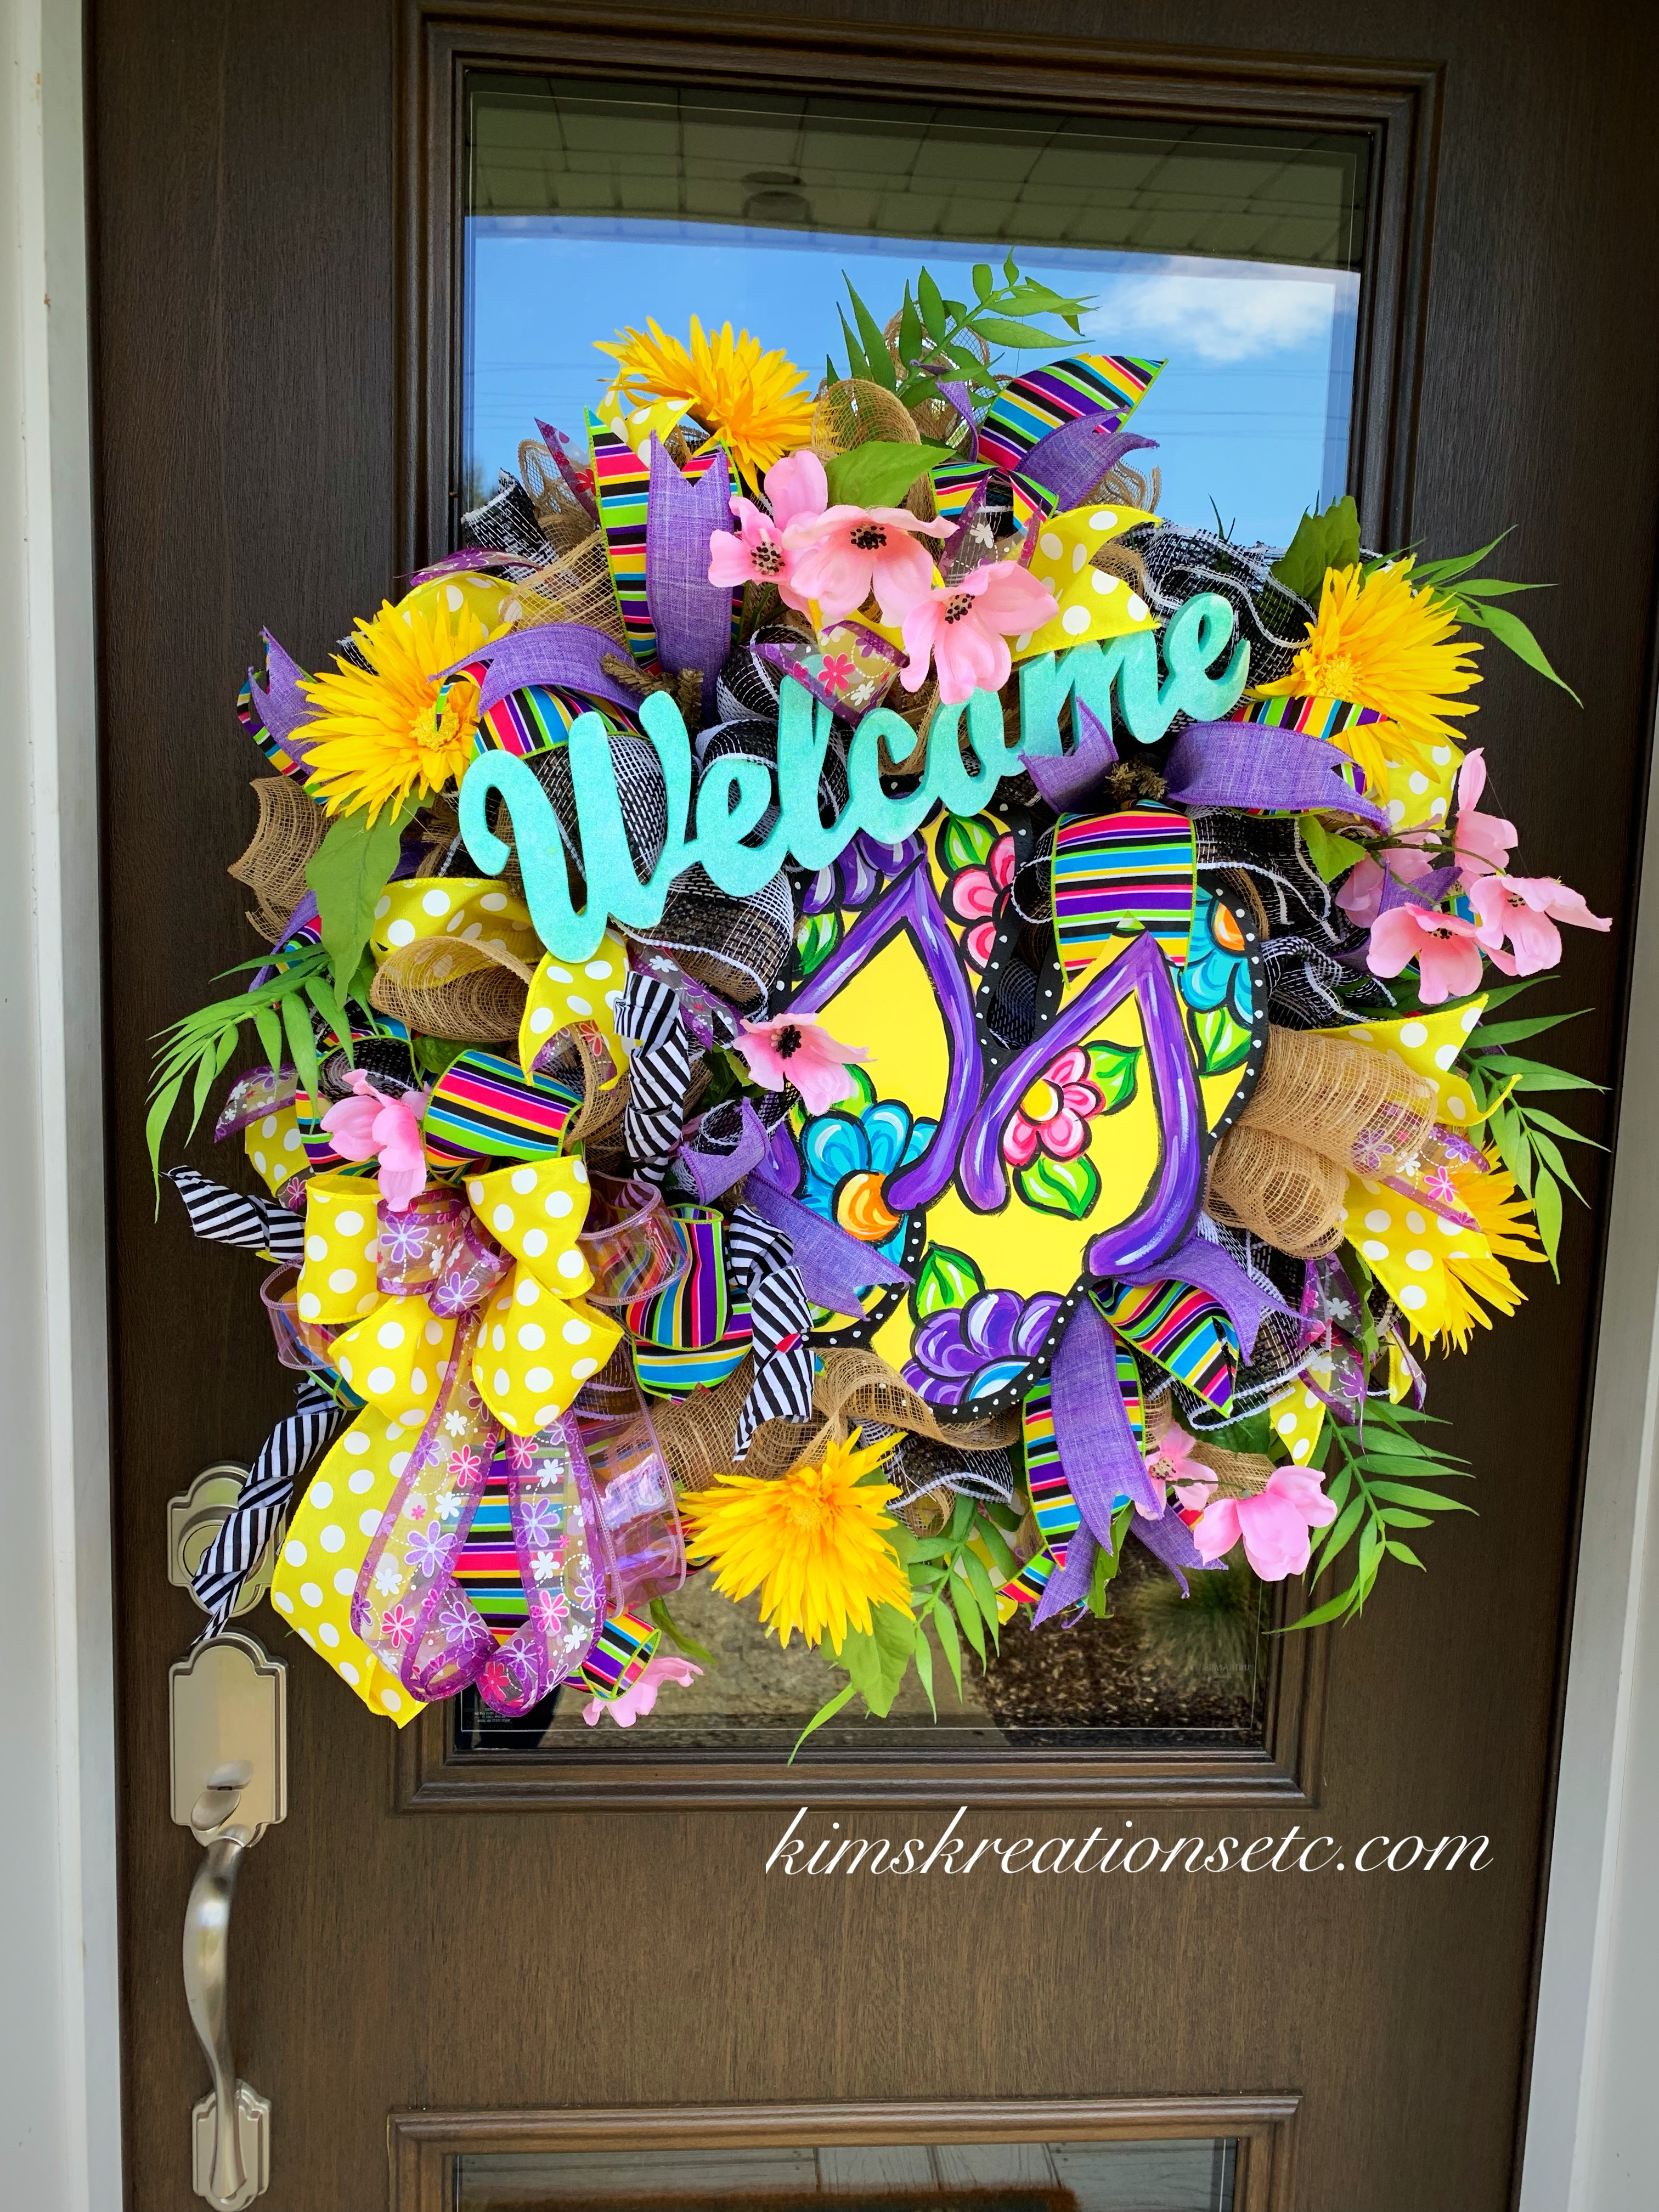 Summer Wreath colorful wreath flip flop wreath summer flip flop wreath Summer Decor bright wreath wreath wreath summer decor